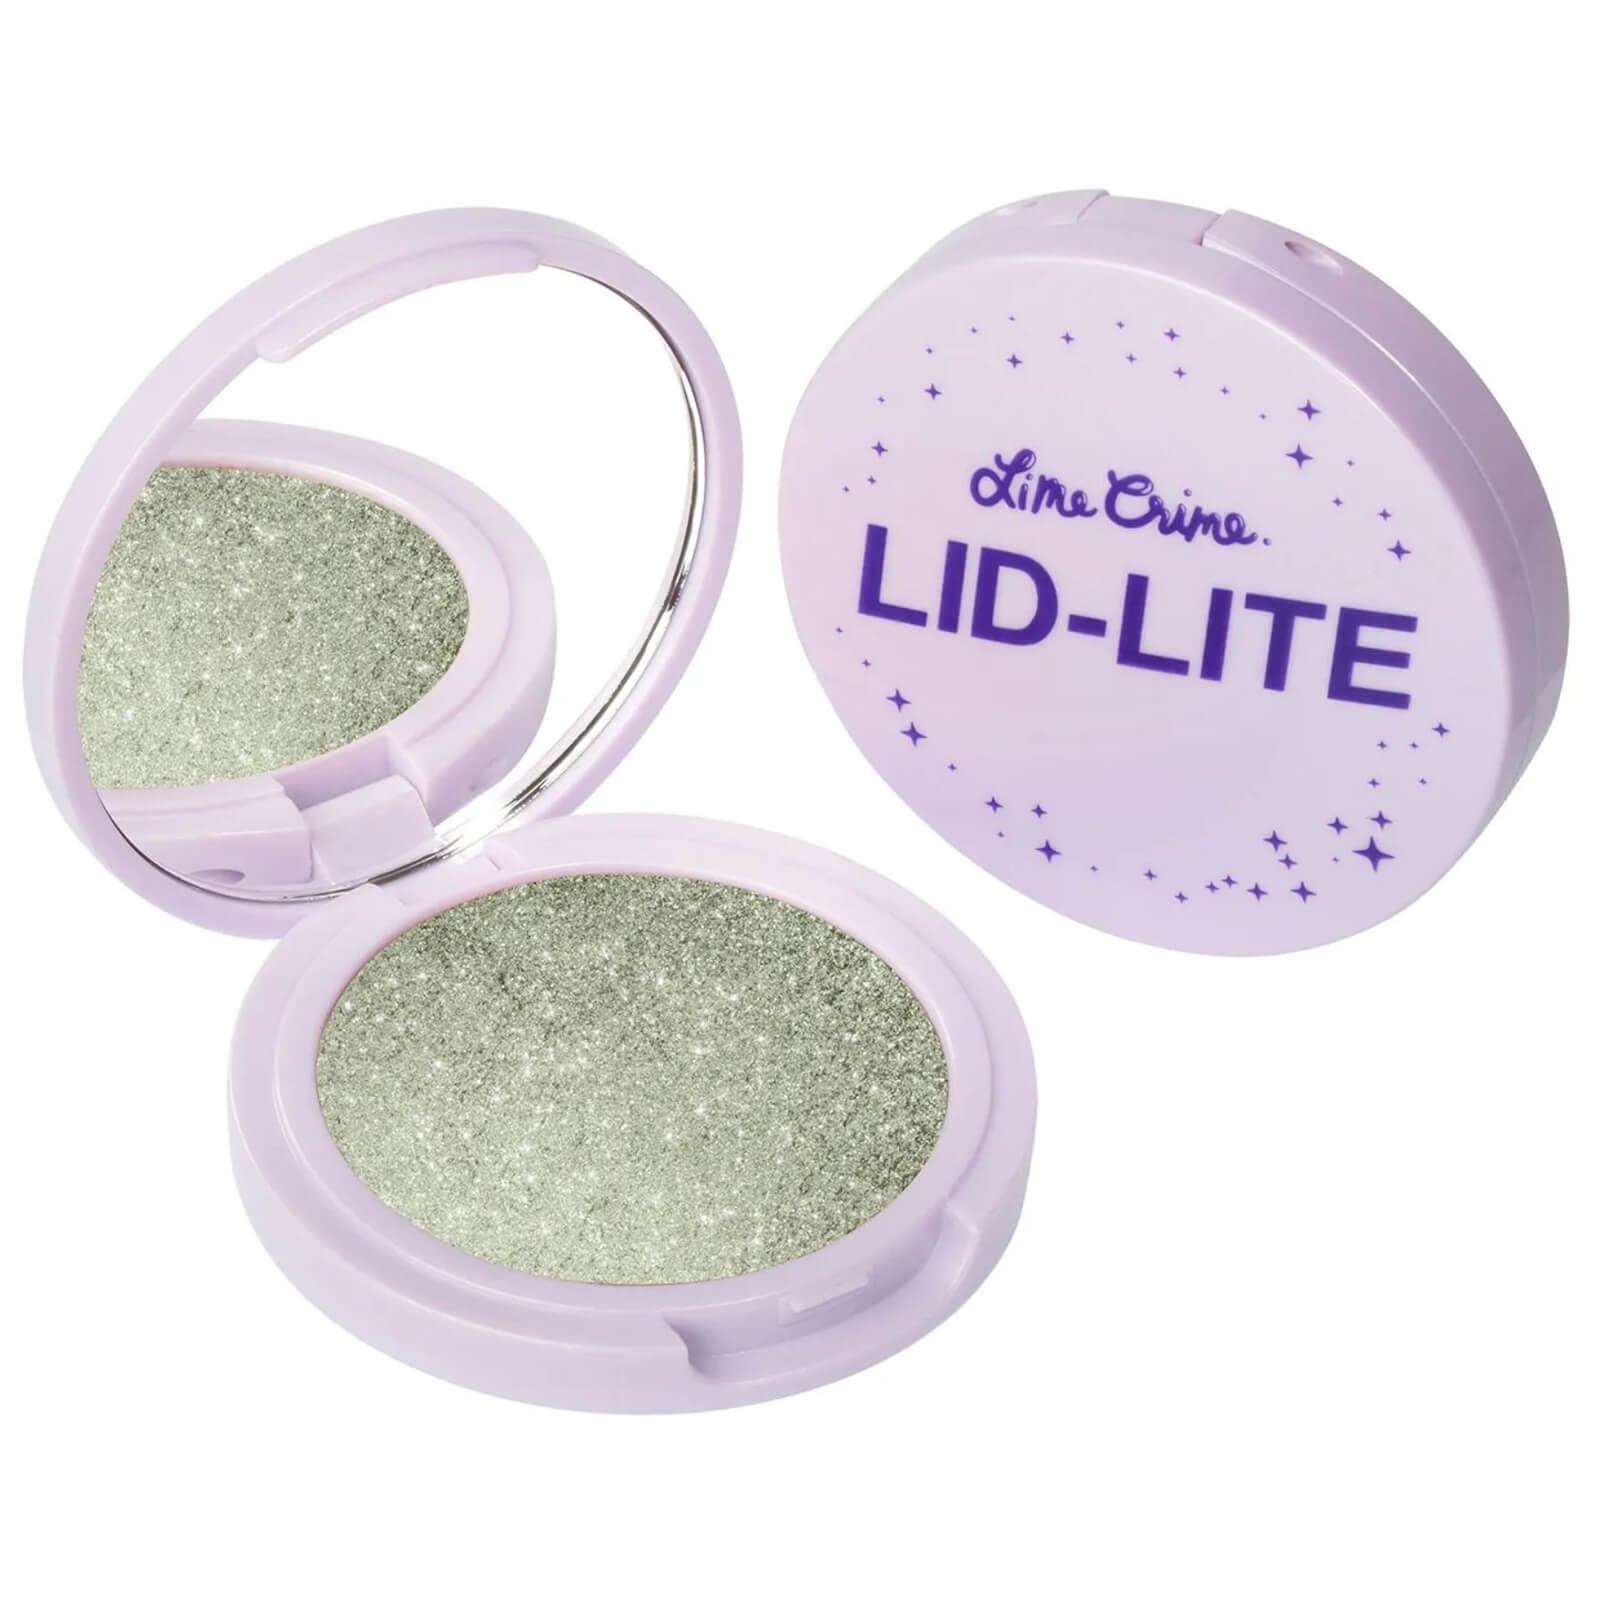 Купить Lime Crime Lid-Lite (Various Shades) - Lily Pad